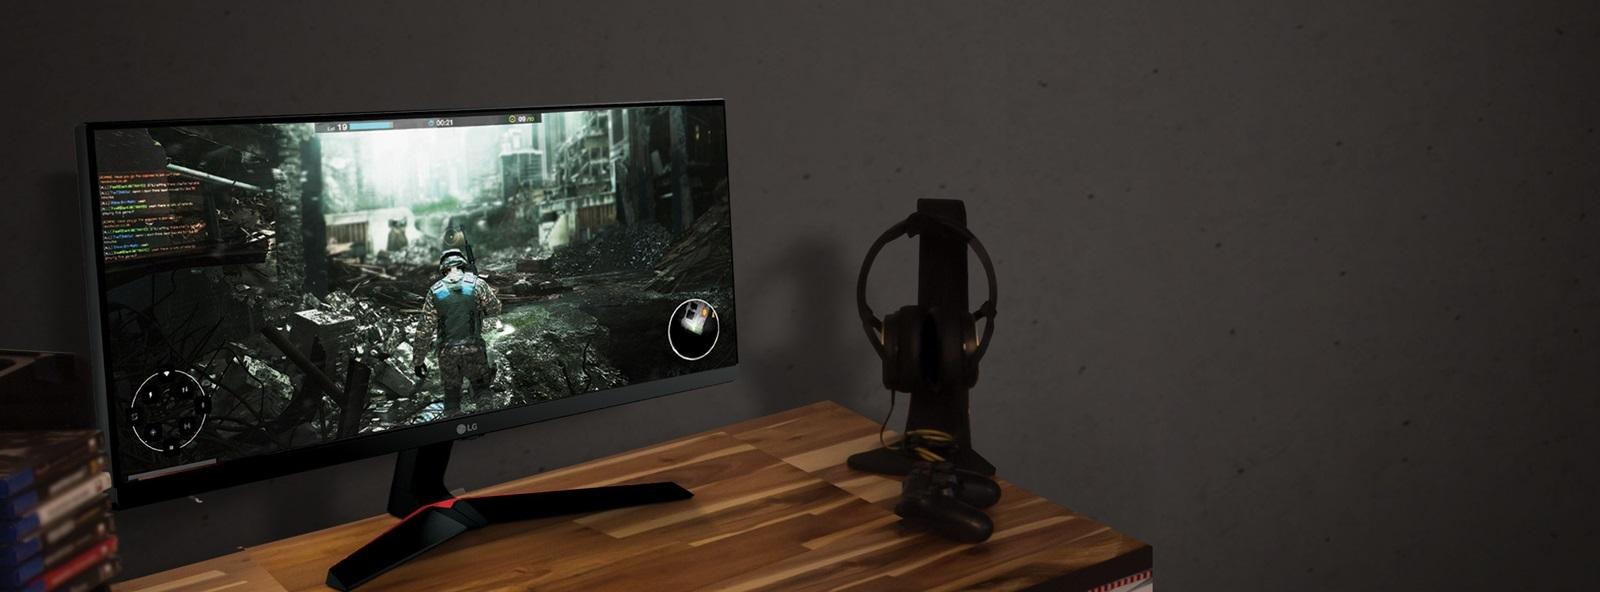 34 Lg 34um69g B Ultrawide Fhd Ips Srgb 1ms Gaming Monitor At Full Hd 24 Inch 24gm79g